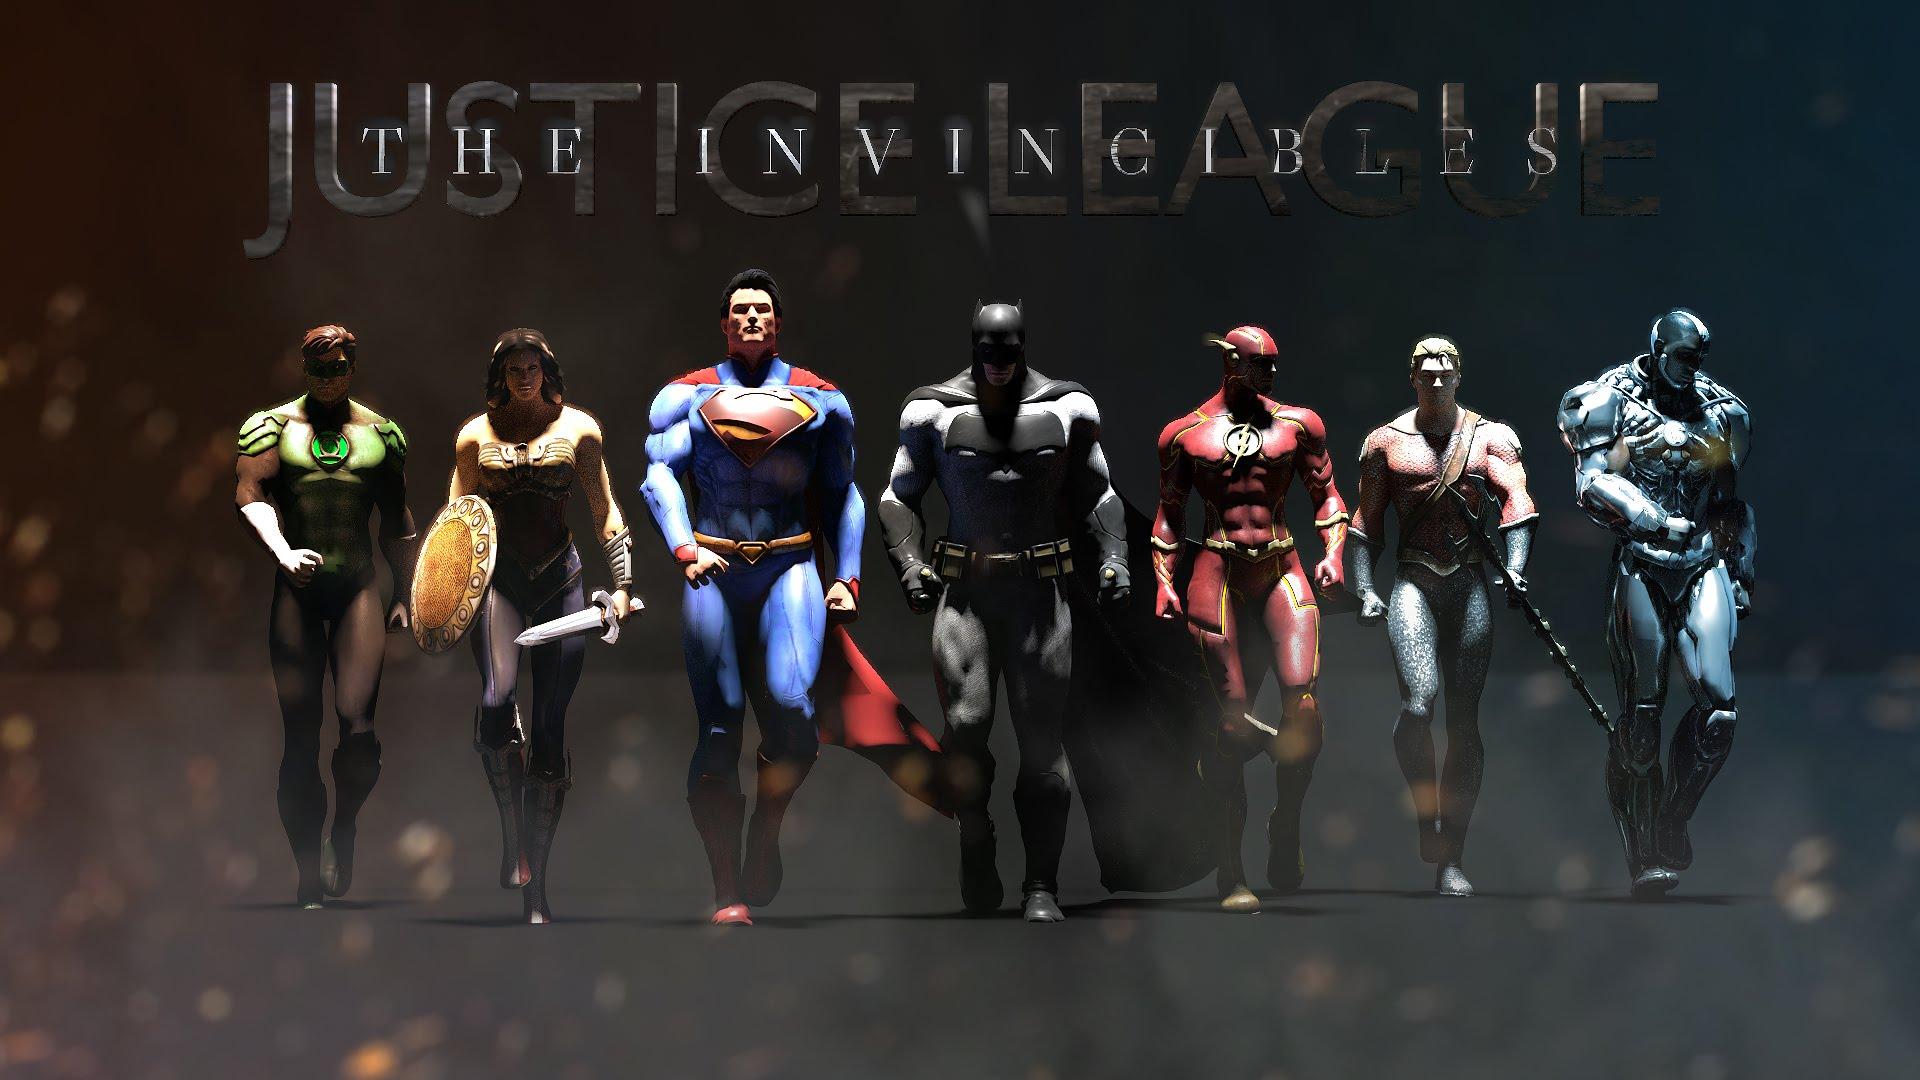 Justice League: The Invincibles (fan film)